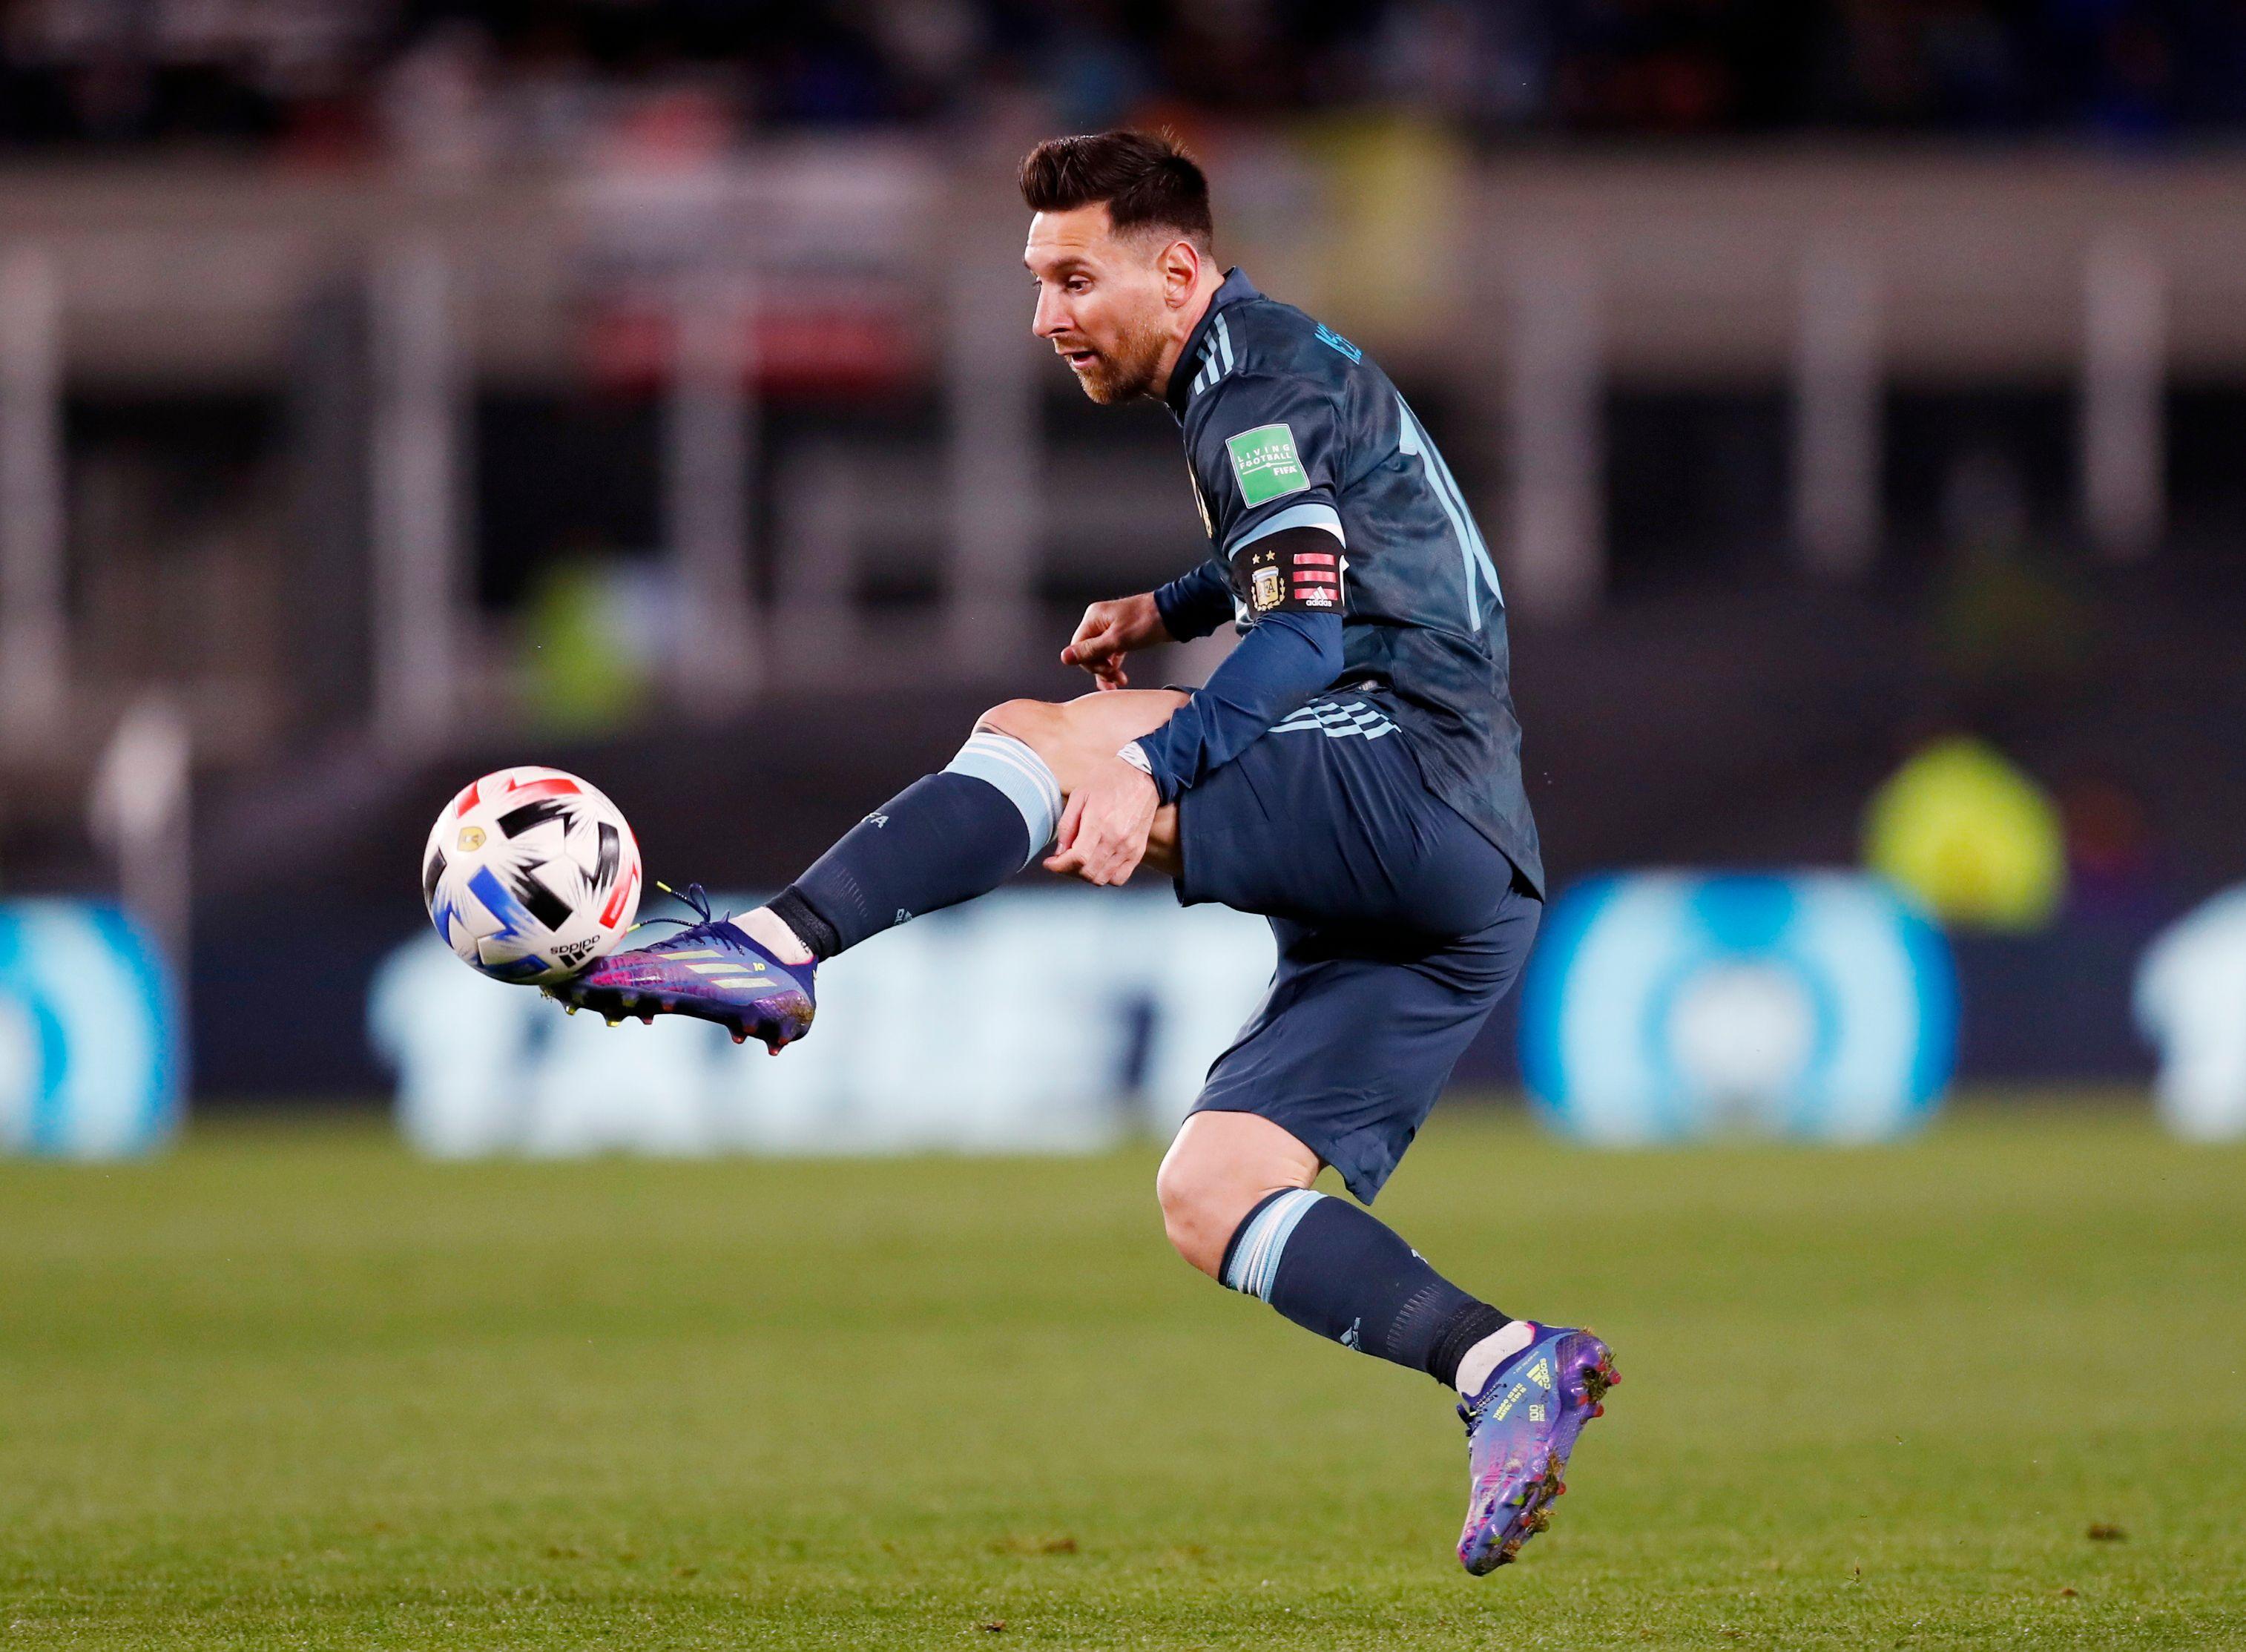 Otra perla de Lionel Messi que suma 153 encuentro con la camiseta argentina a nivel mayores